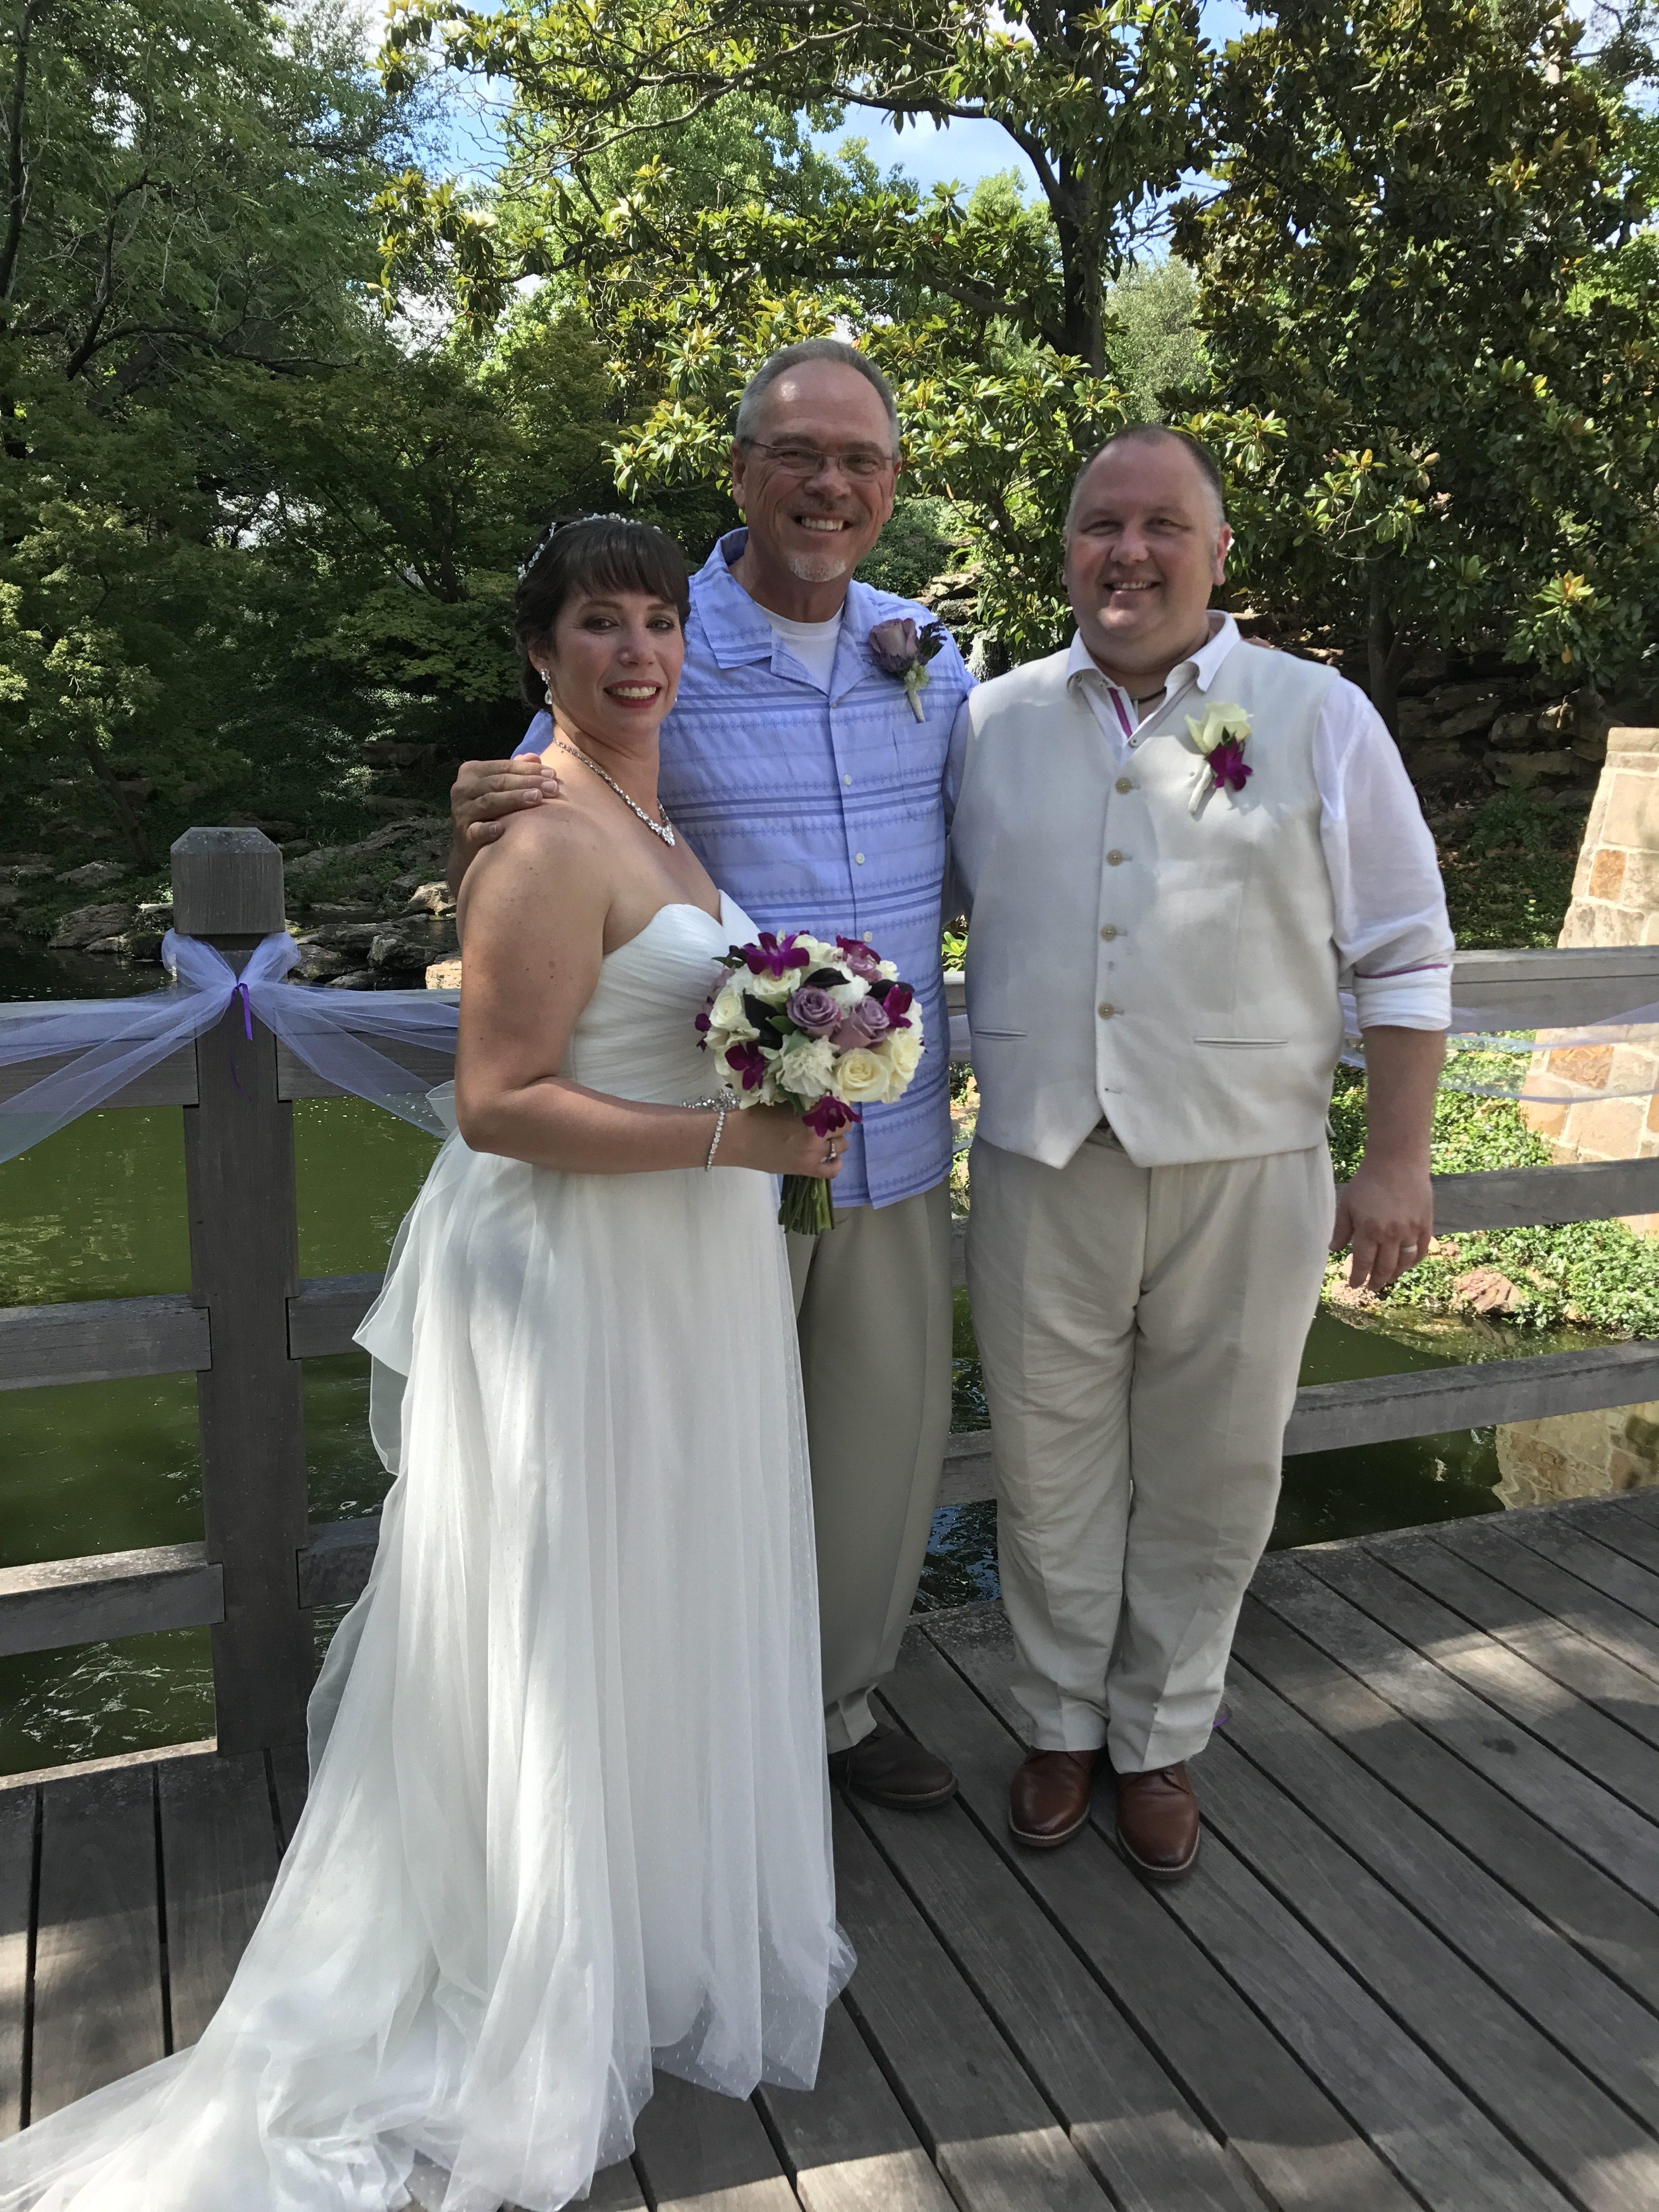 Choosing The Right Wedding Venue